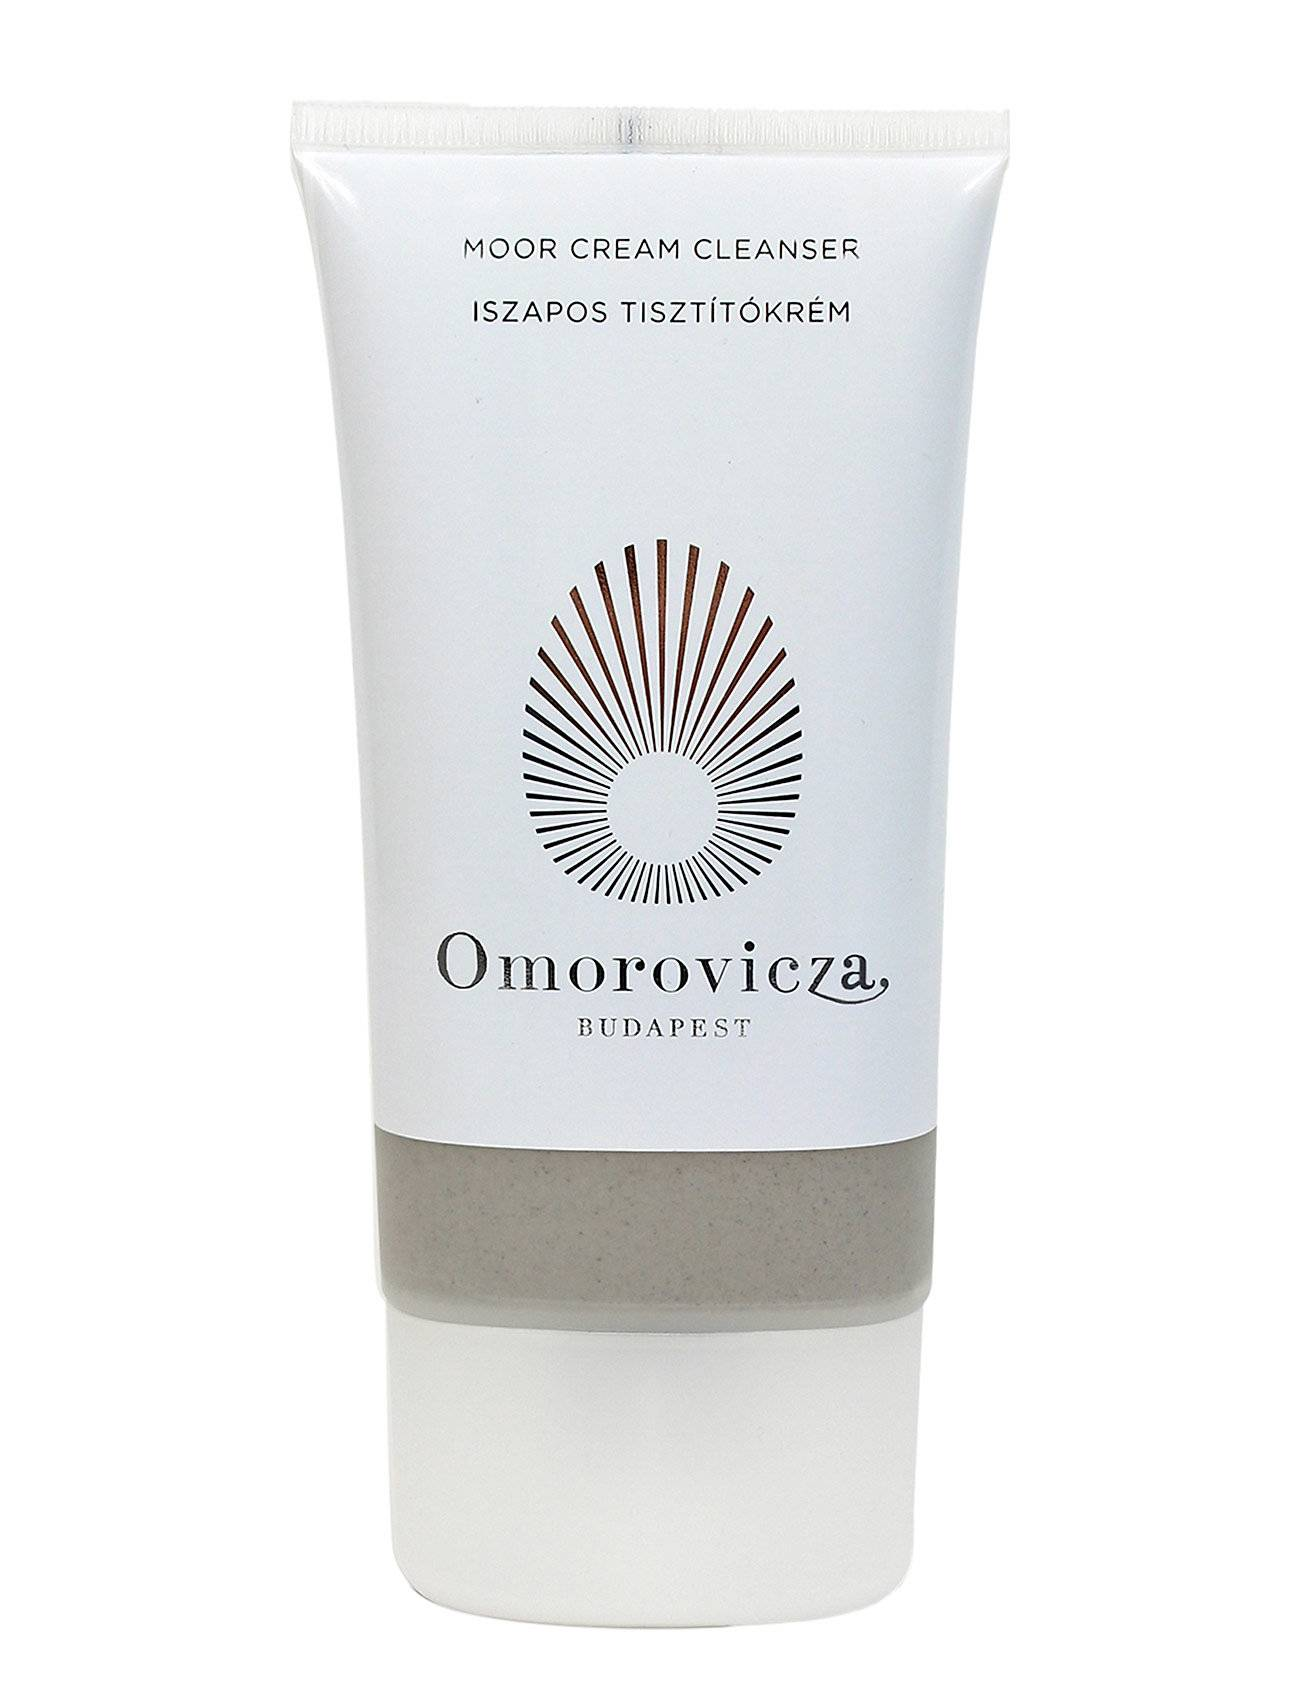 Omorovicza Omo Moor Mud Moor Cream Cleanser